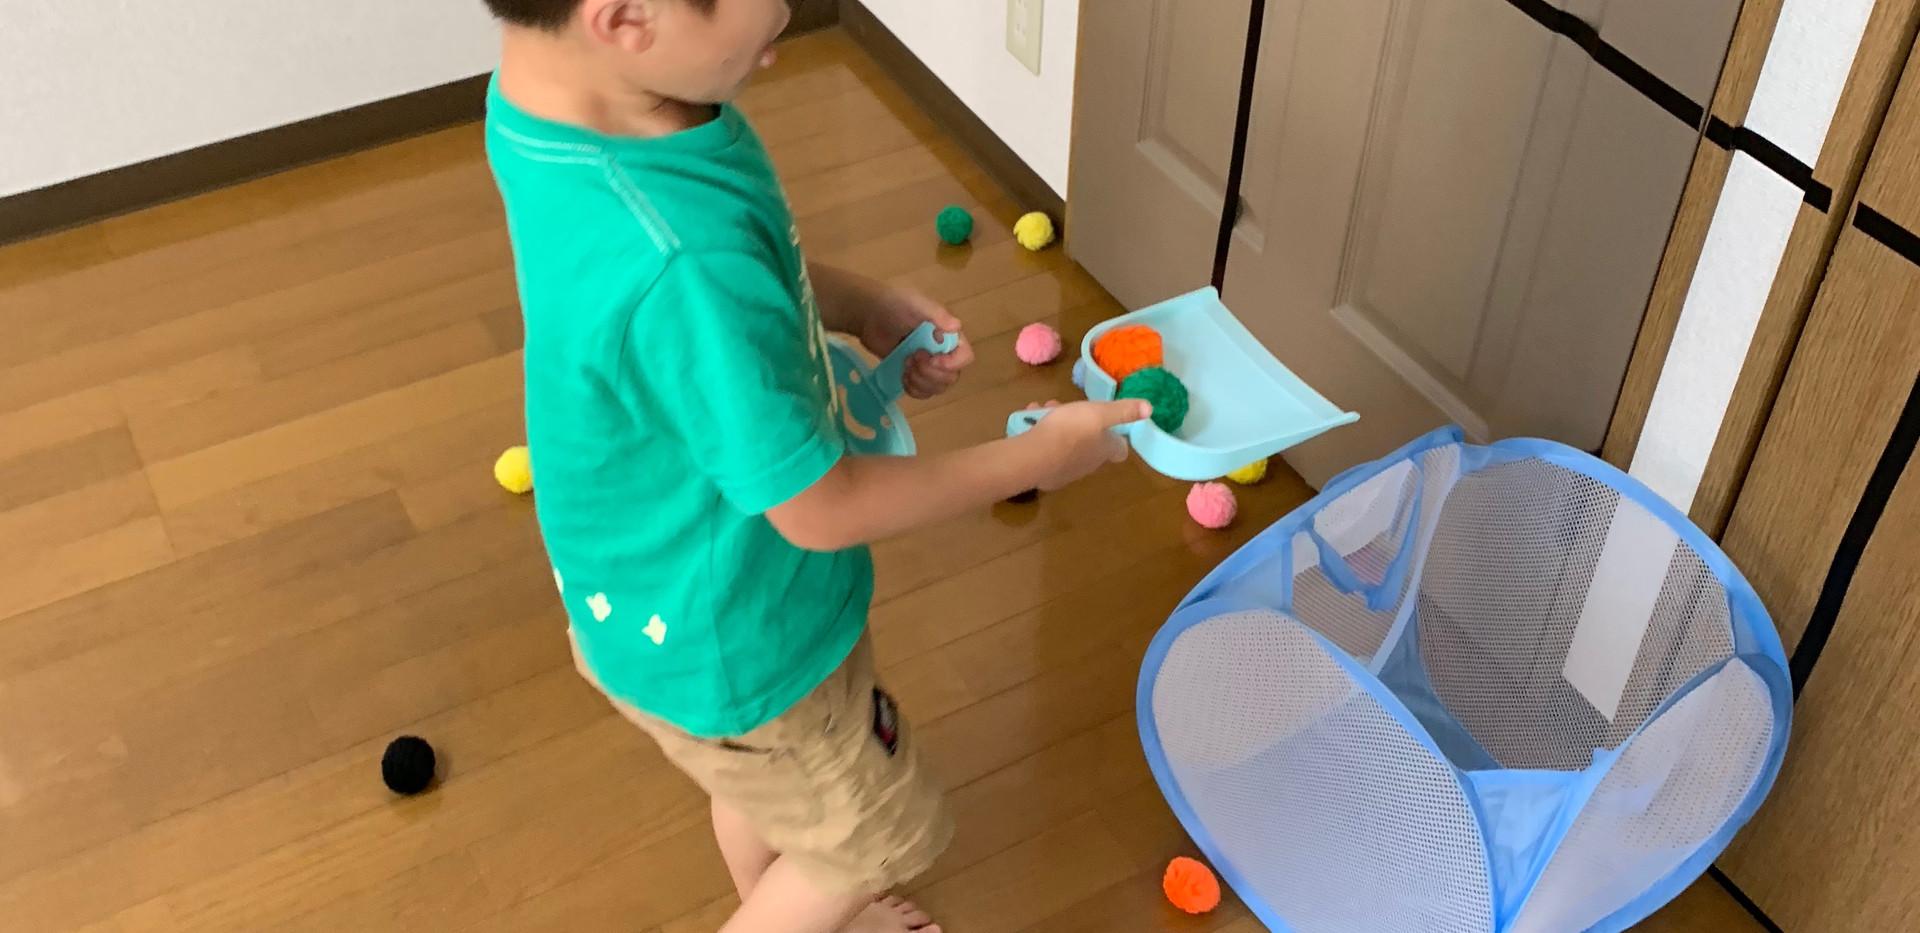 clean up game boy.JPG